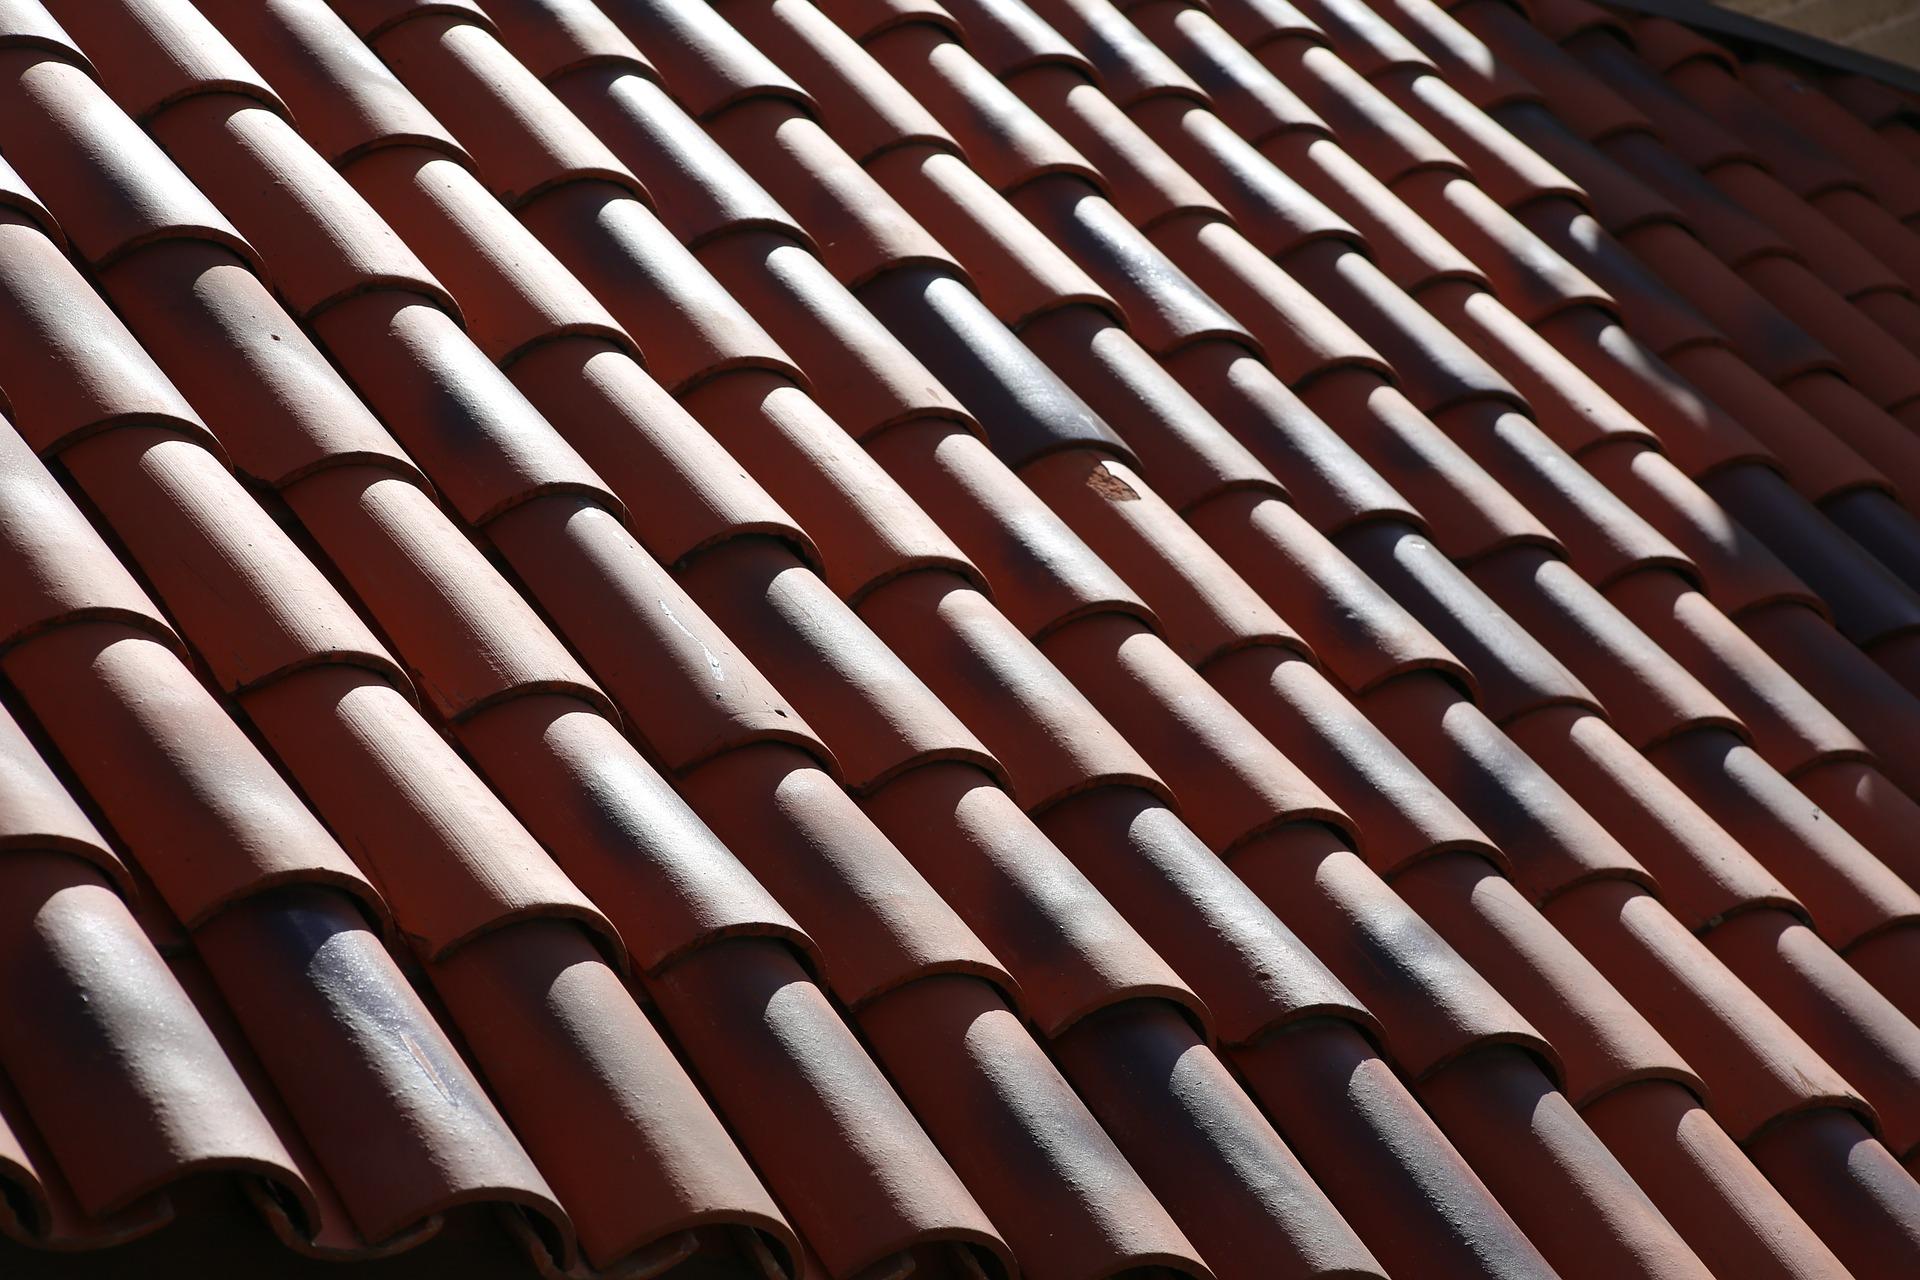 roof-446211_1920.jpg